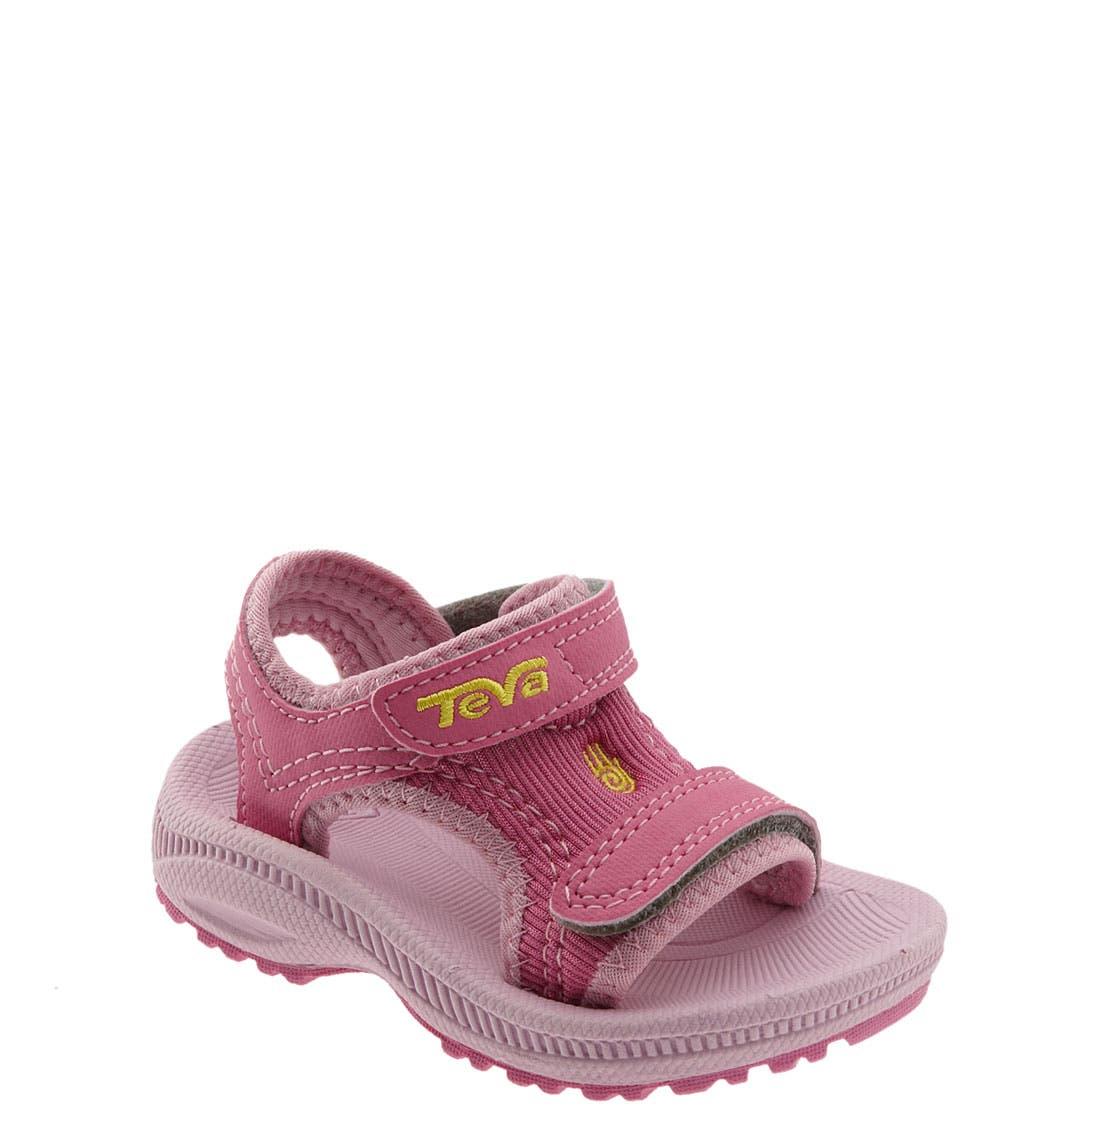 Alternate Image 1 Selected - Teva 'I Psyclone' Athletic Sandal (Baby, Walker & Toddler)